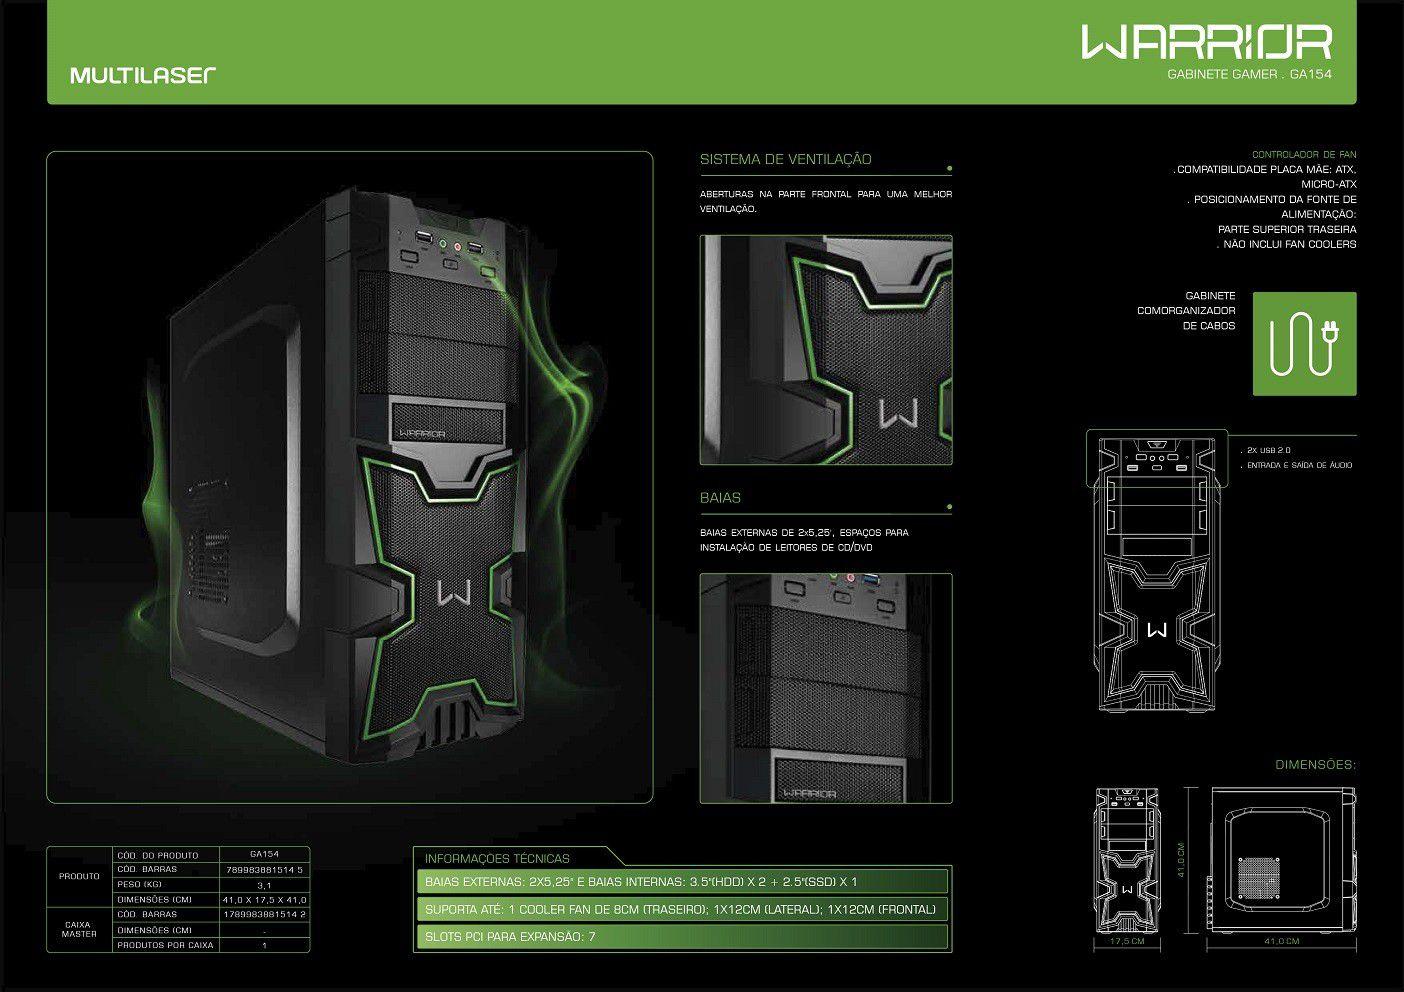 Gabinete PC Gamer Warrior Preto e Verde Grande Multilaser Ga154